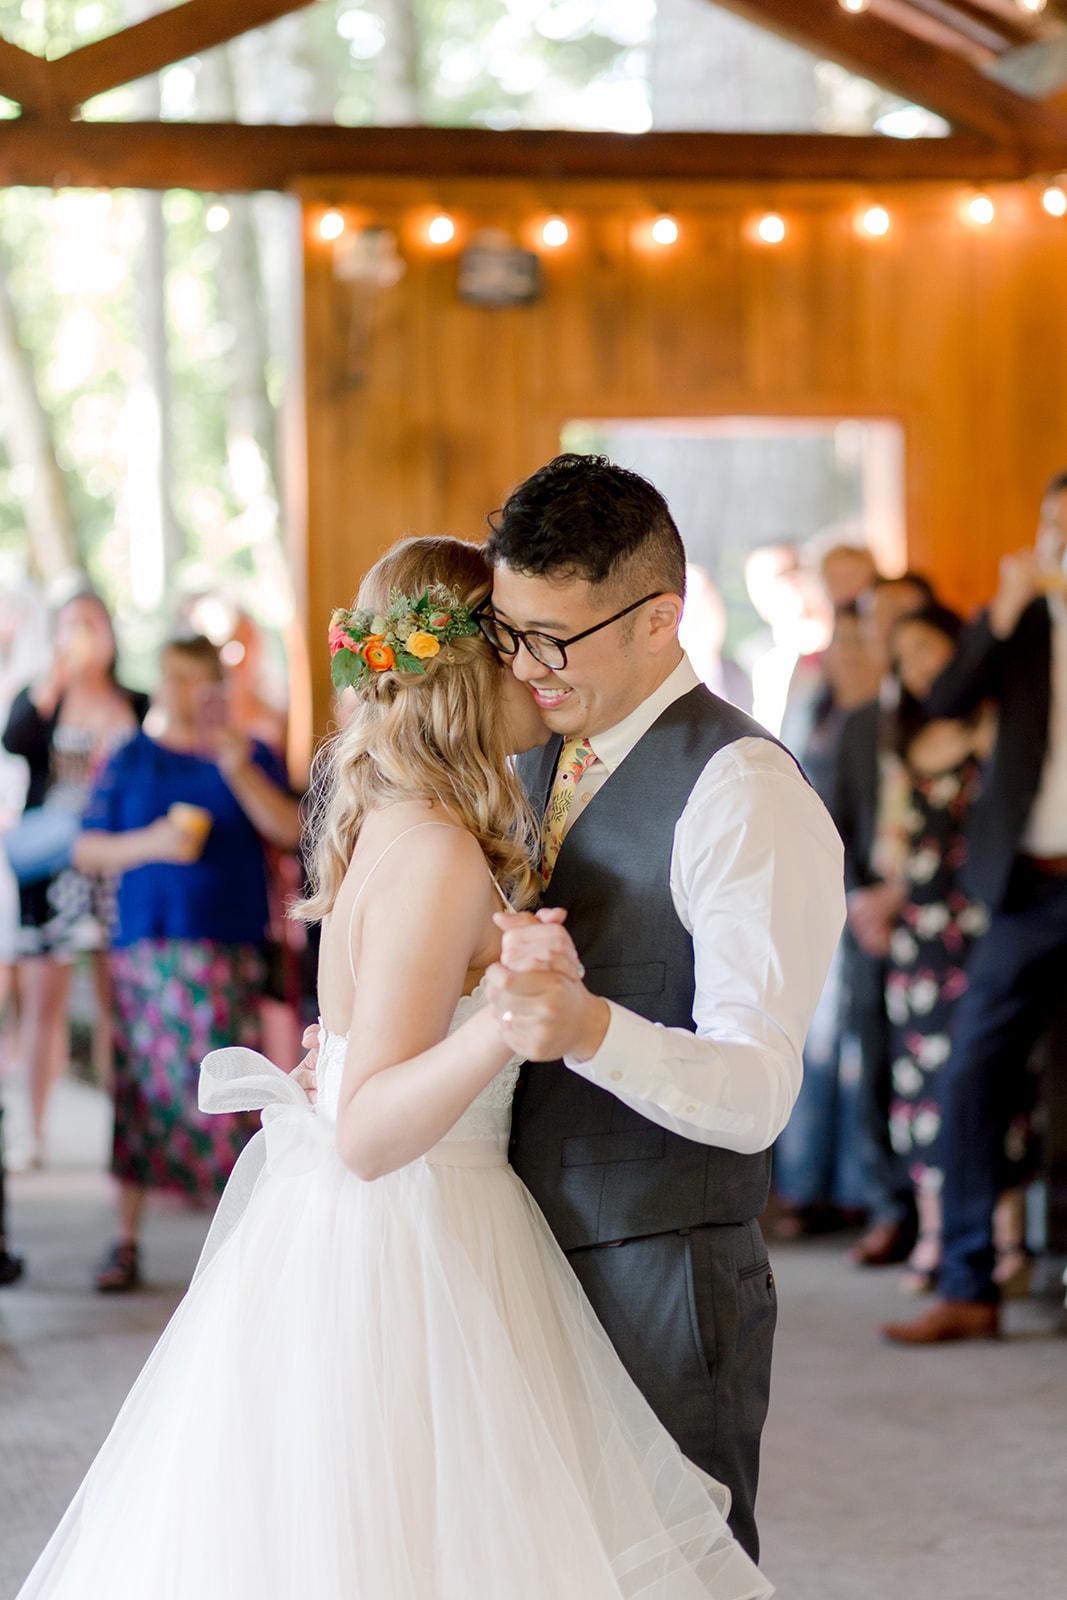 2019 Bryan + Amanda Wedding - 647.jpg